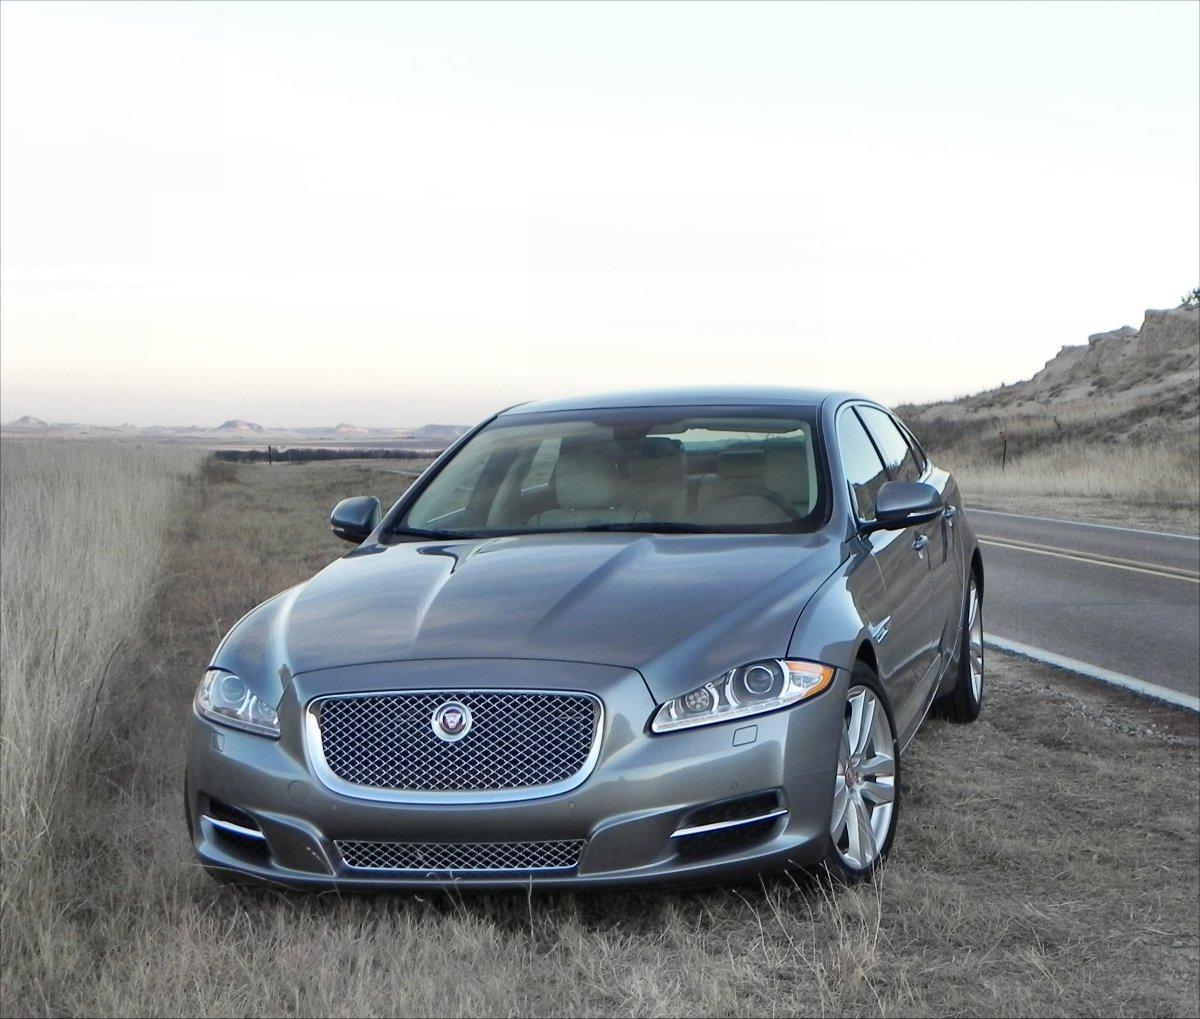 2015 Xf Jaguar: 2015 Jaguar XJL Portfolio AWD : Review